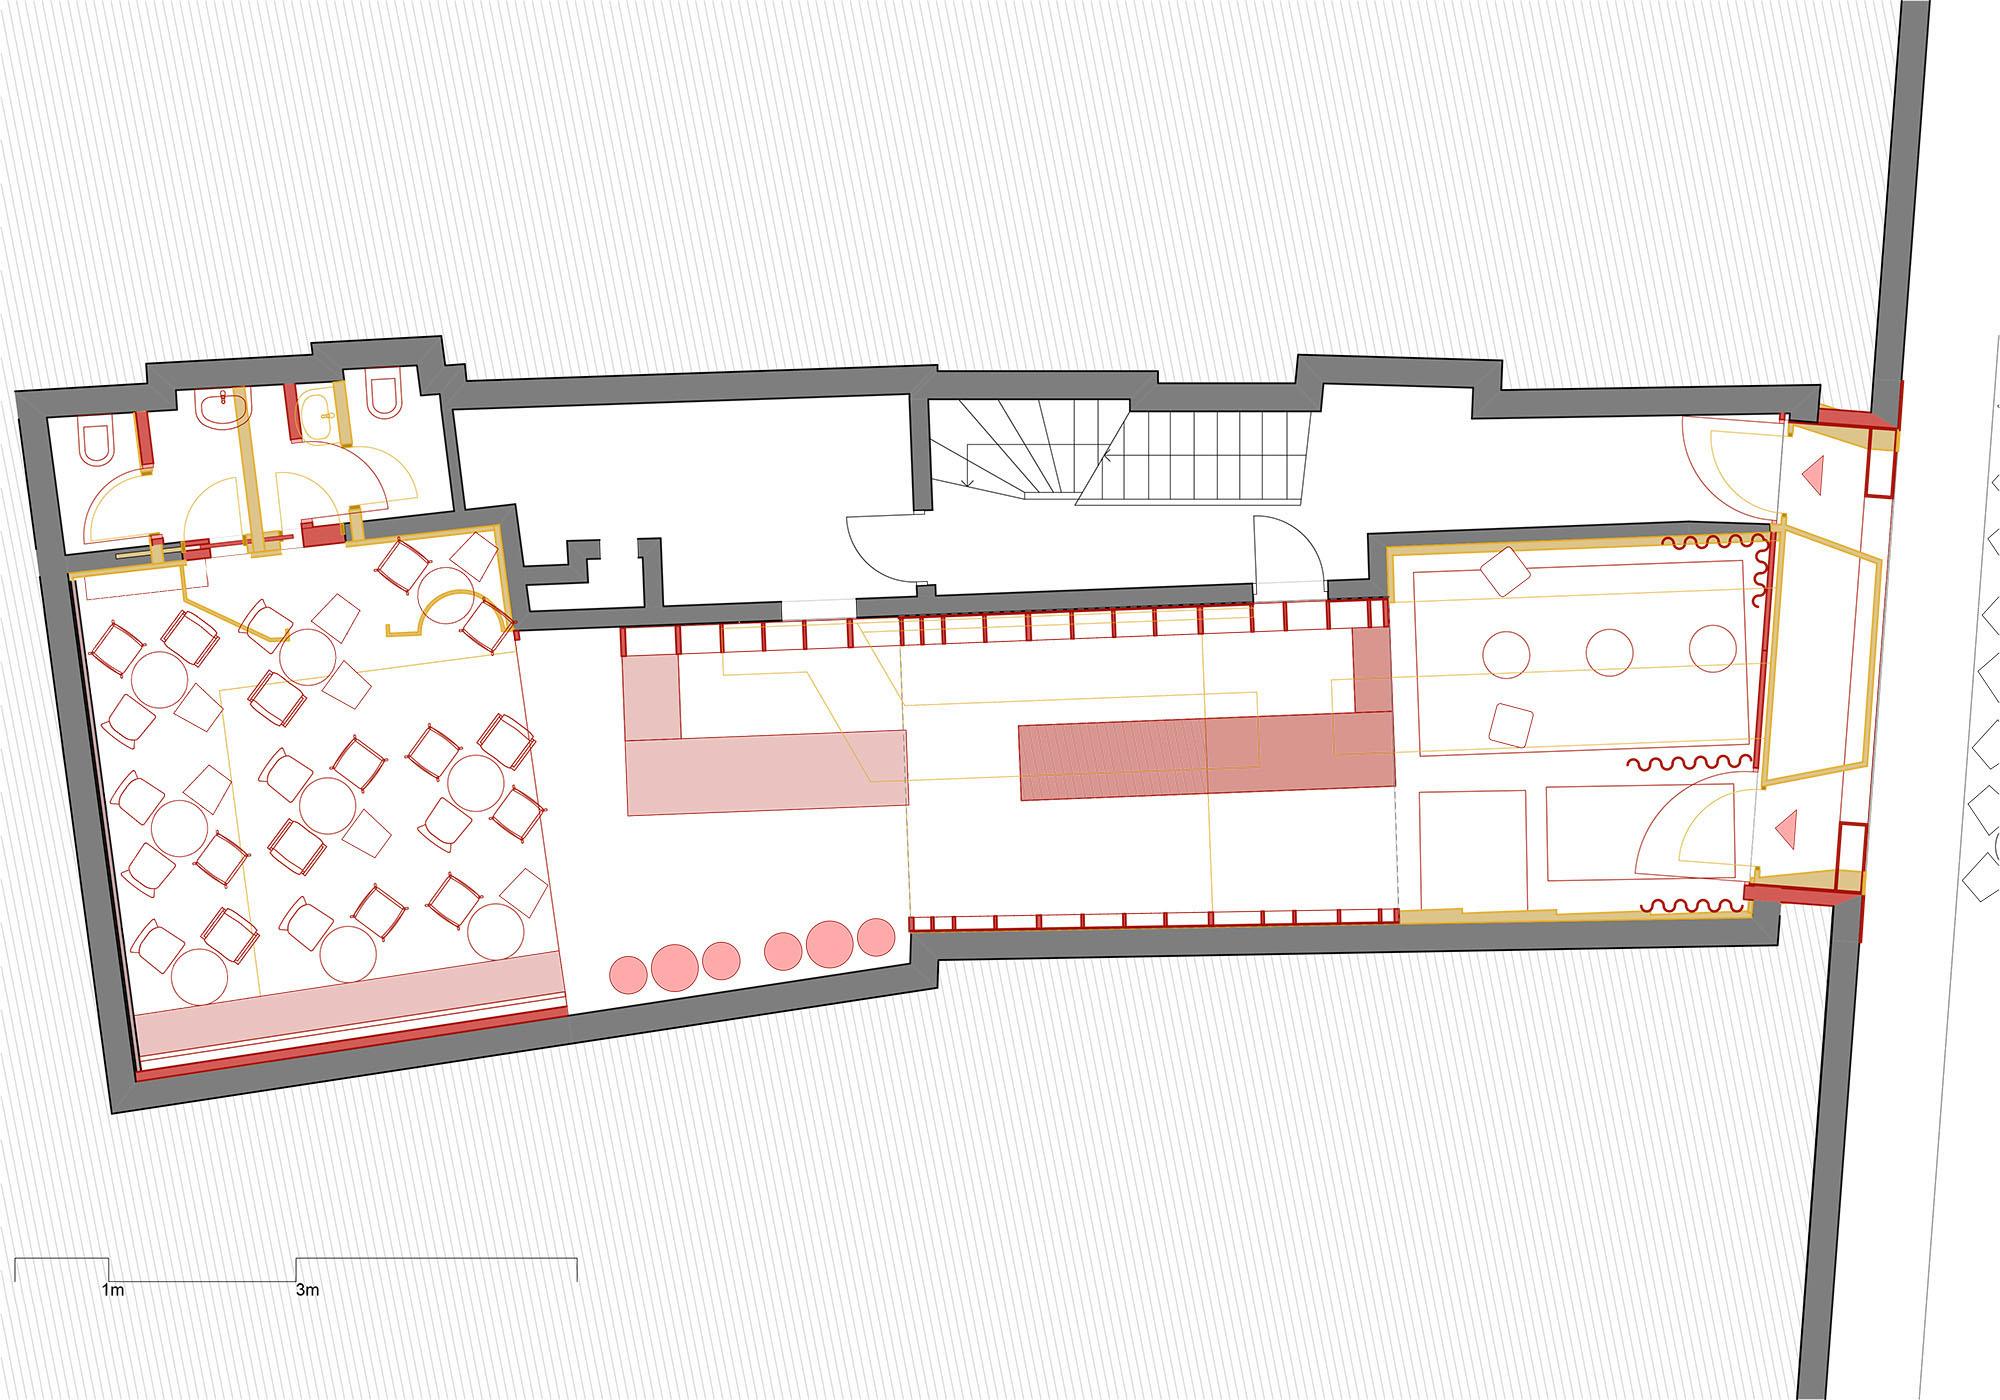 floor plan - demolition/new construction }